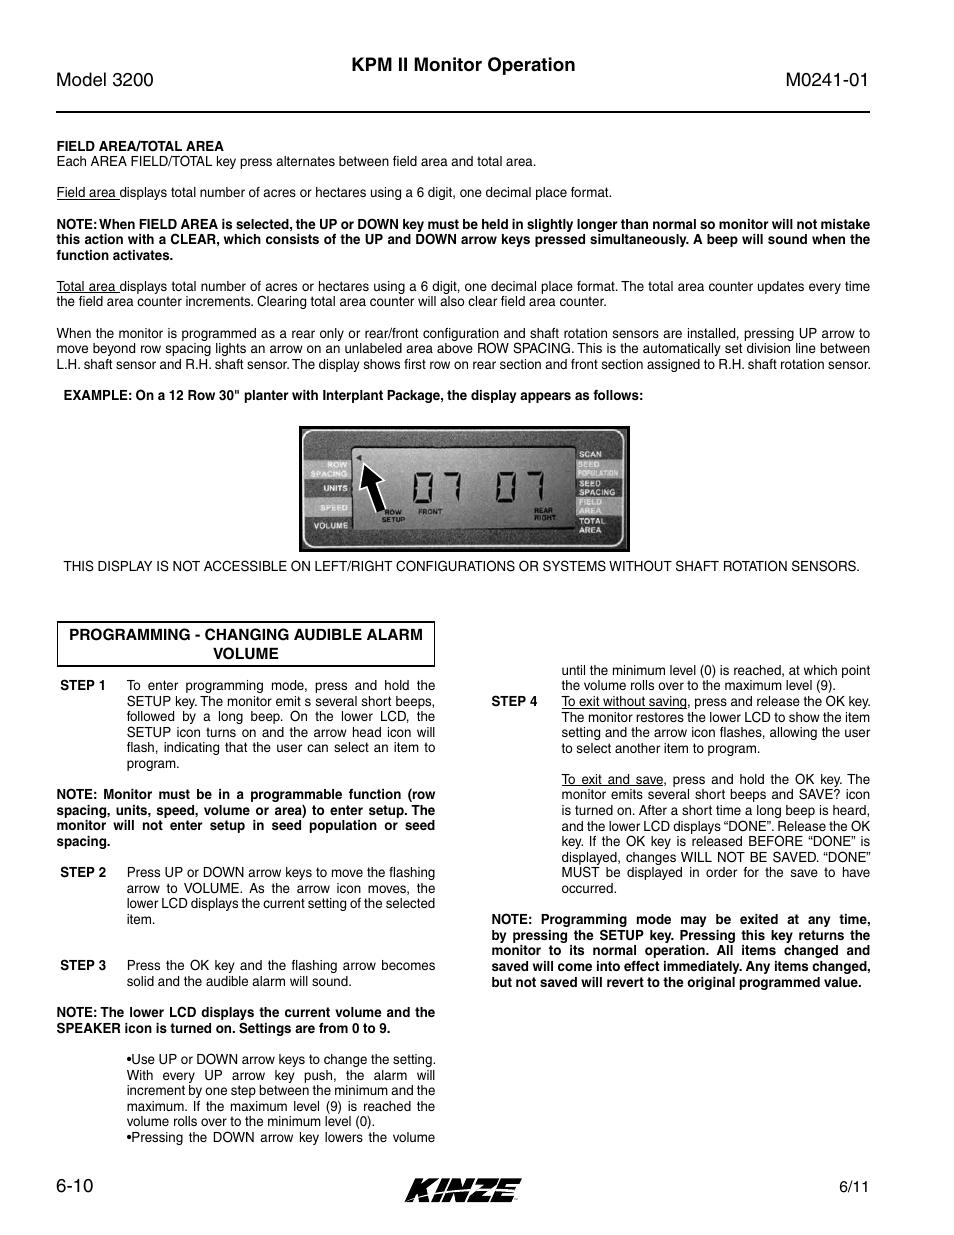 Programming - changing audible alarm volume -10, Kpm ii monitor operation |  Kinze 3200